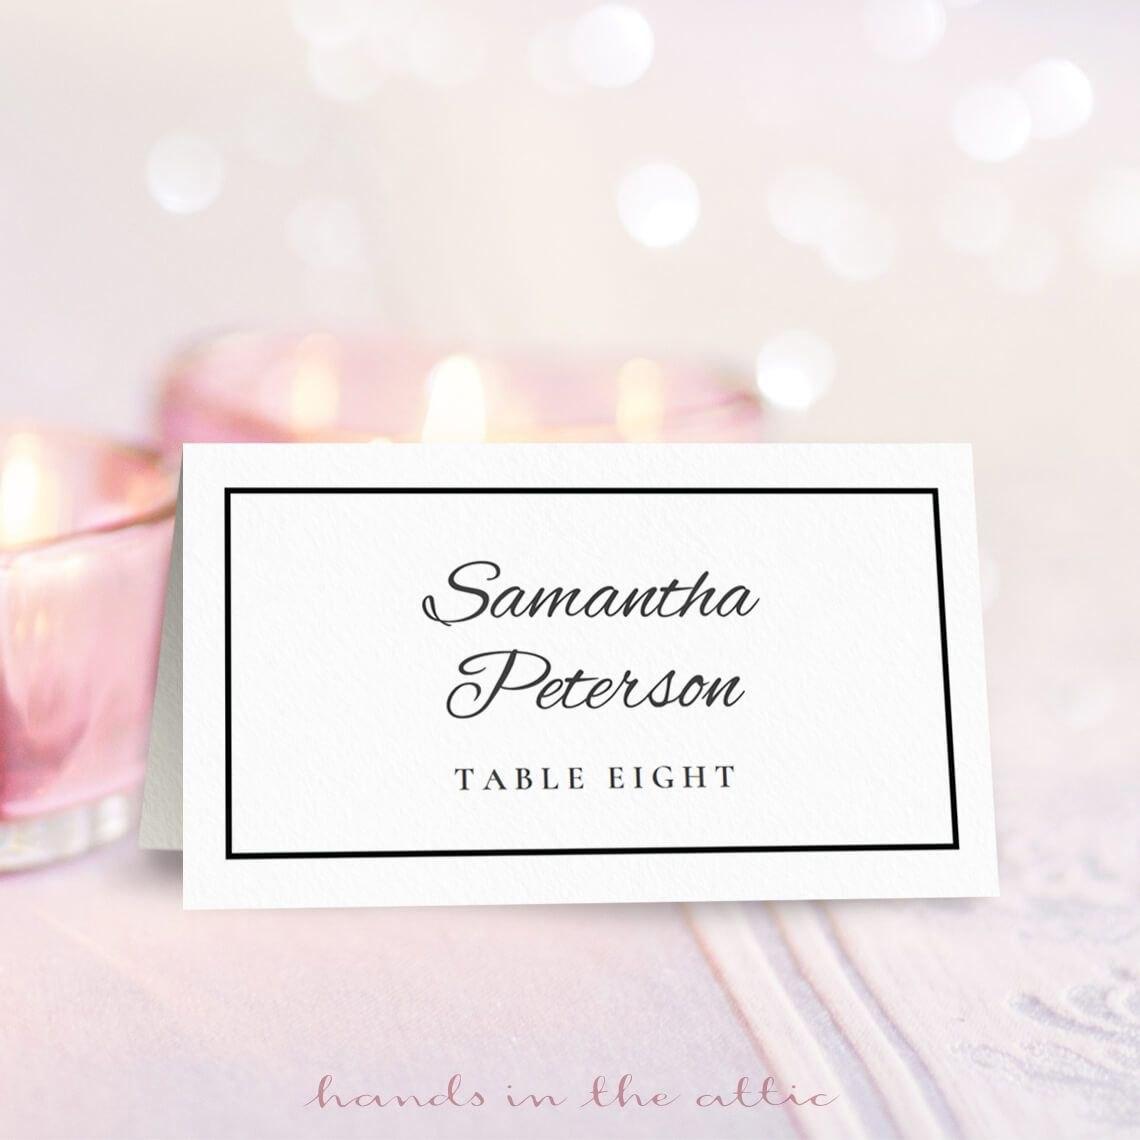 Wedding Place Card Template  Free On Handsintheattic  Free Regarding Amscan Imprintable Place Card Template